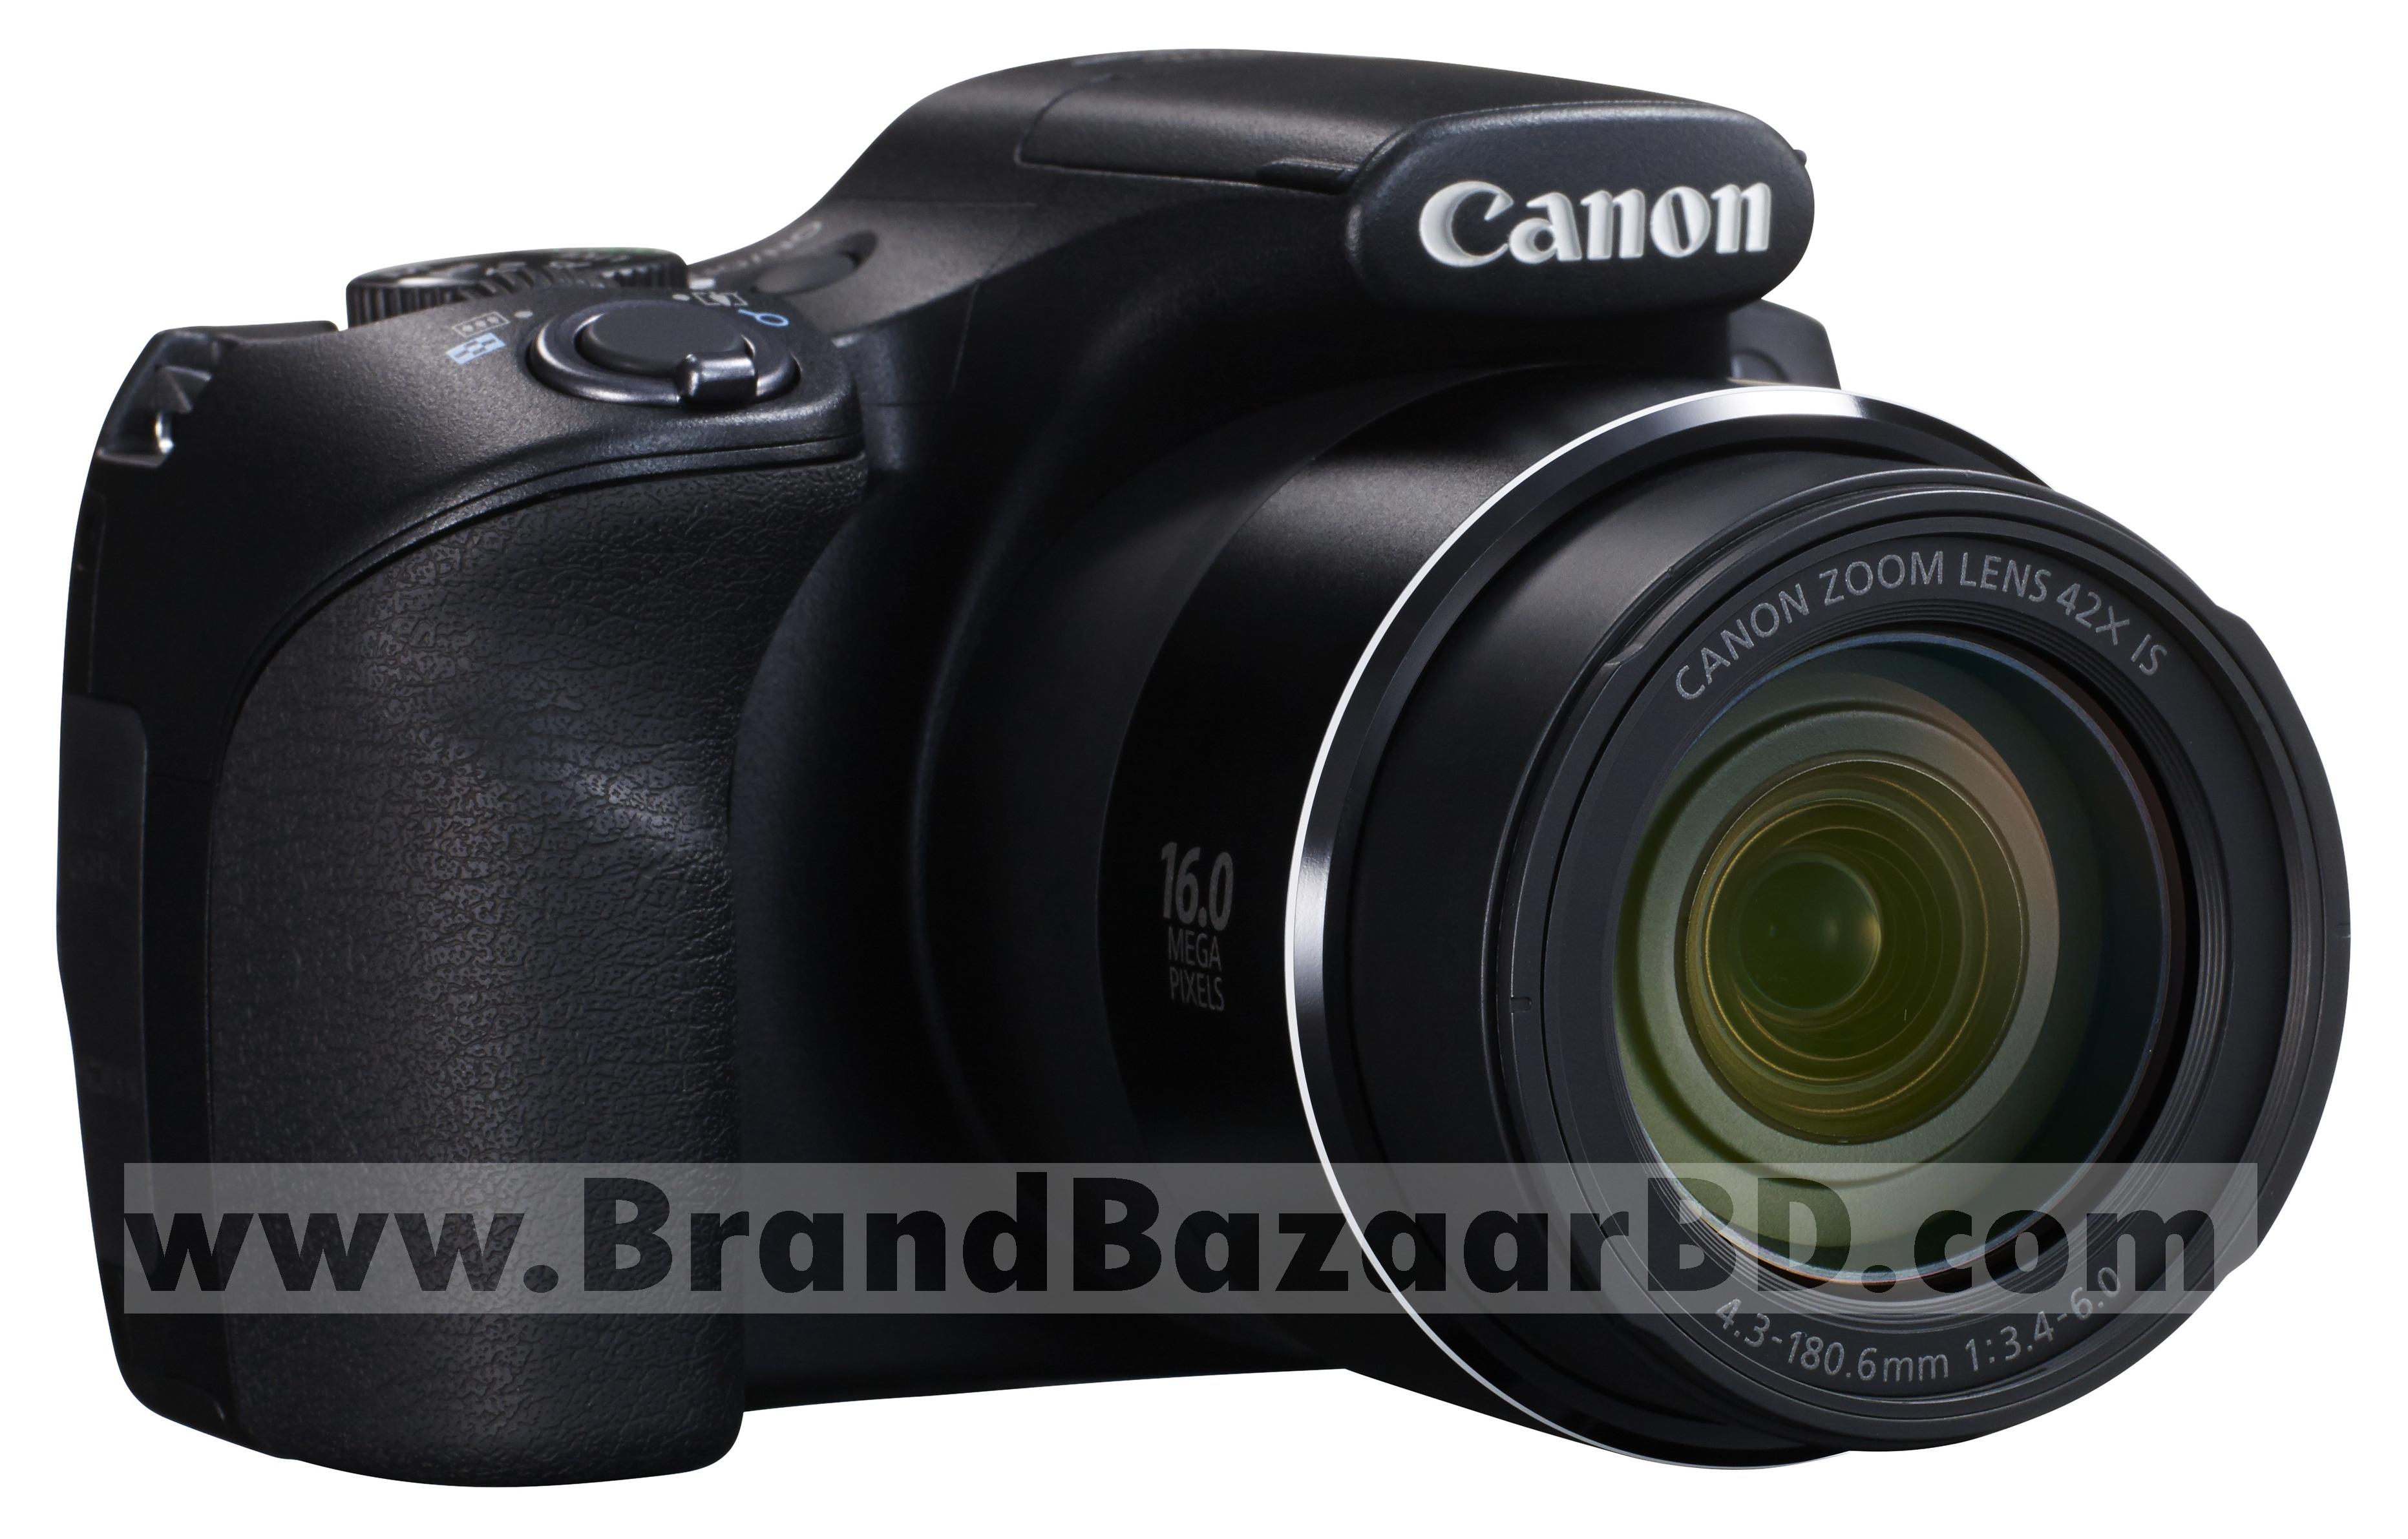 Canon Digital Camera SX 400 – Welcome to BrandBazaarBD.com | Best ...